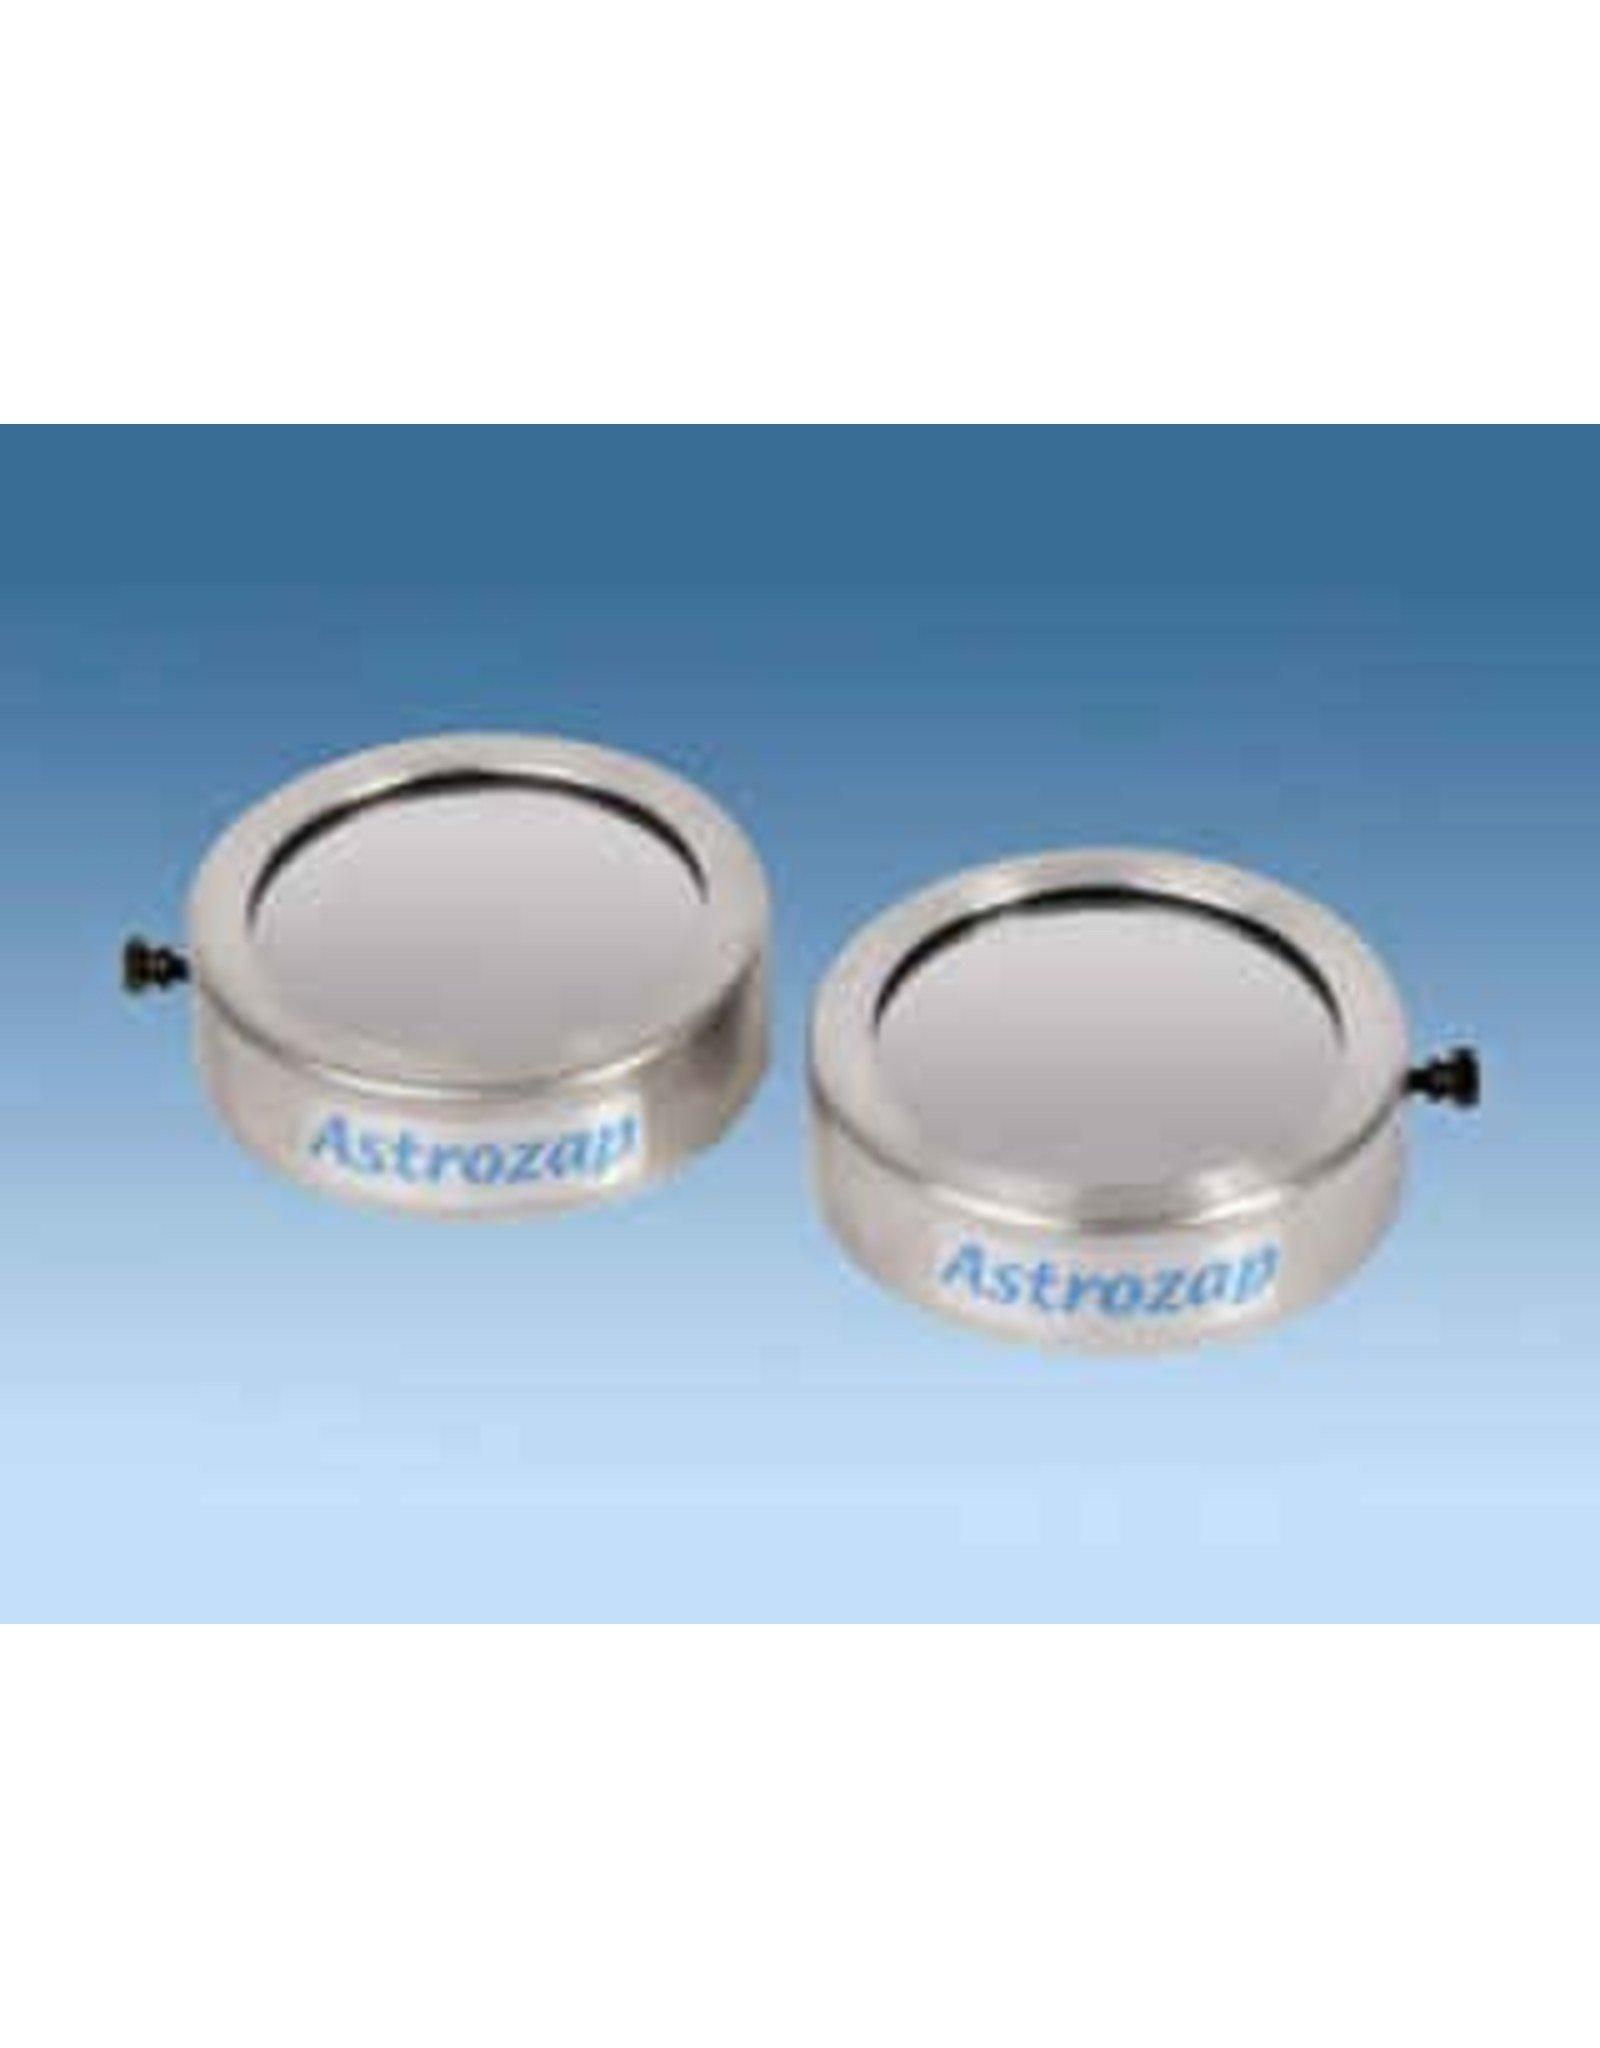 Astrozap AZ-1577 Glass Solar Filter - Binocular - 86mm-92mm